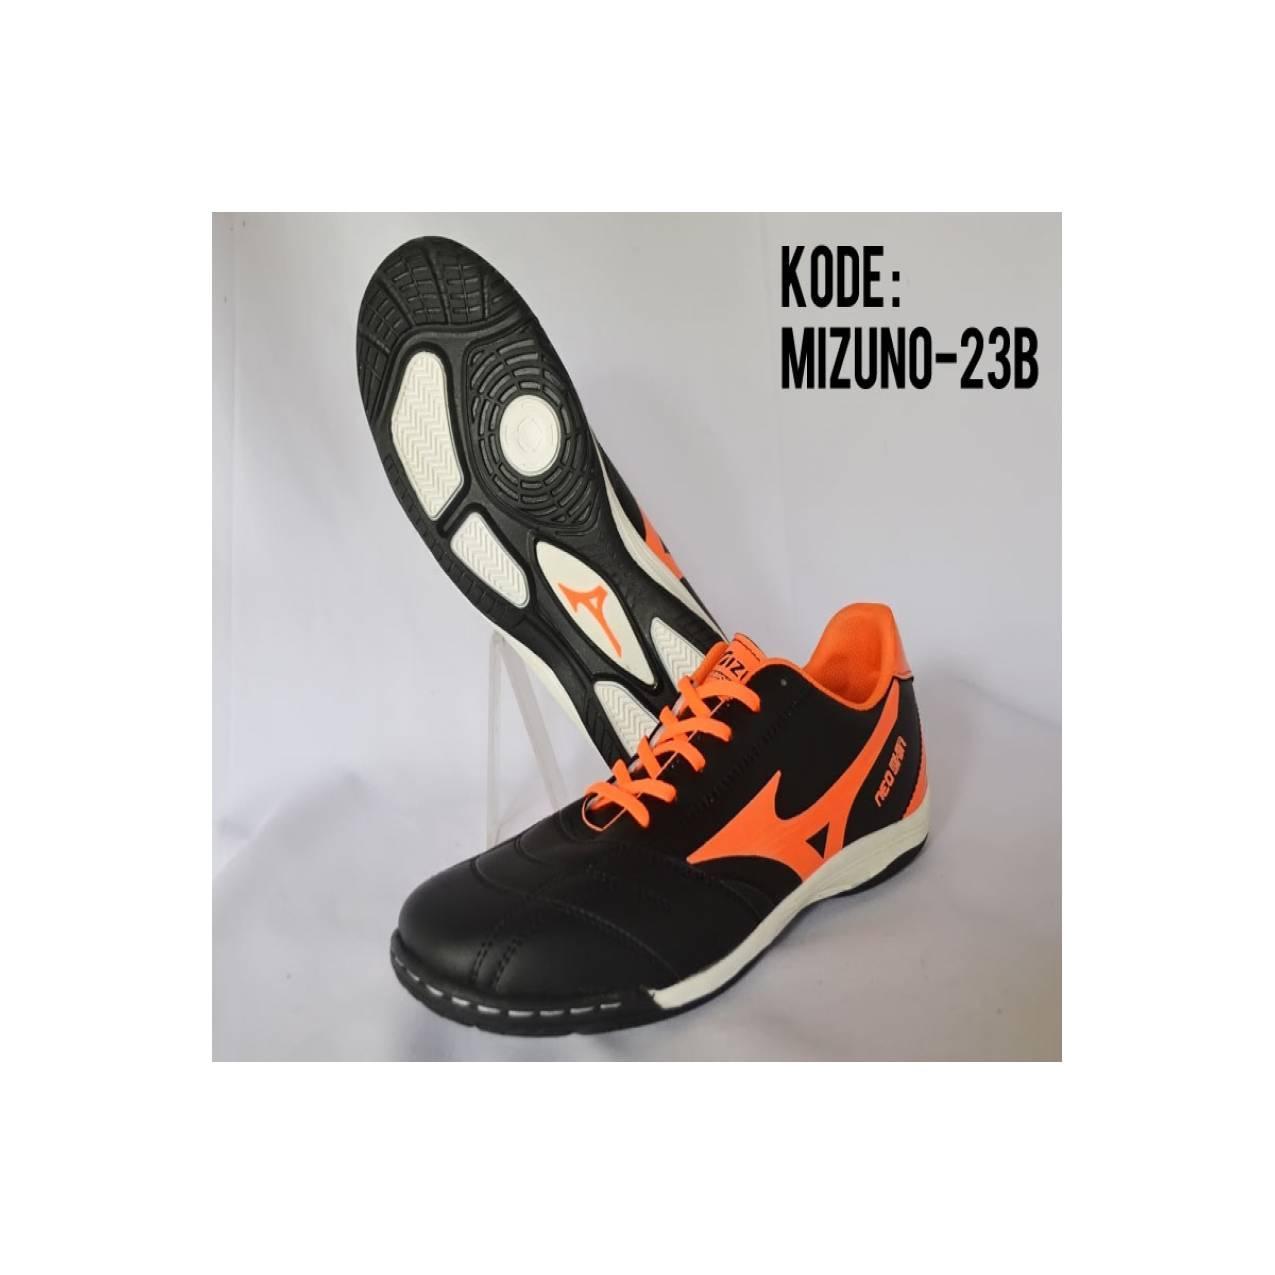 Sepatu Futsal Mizuno KW 1 Kode Mizuno 23B